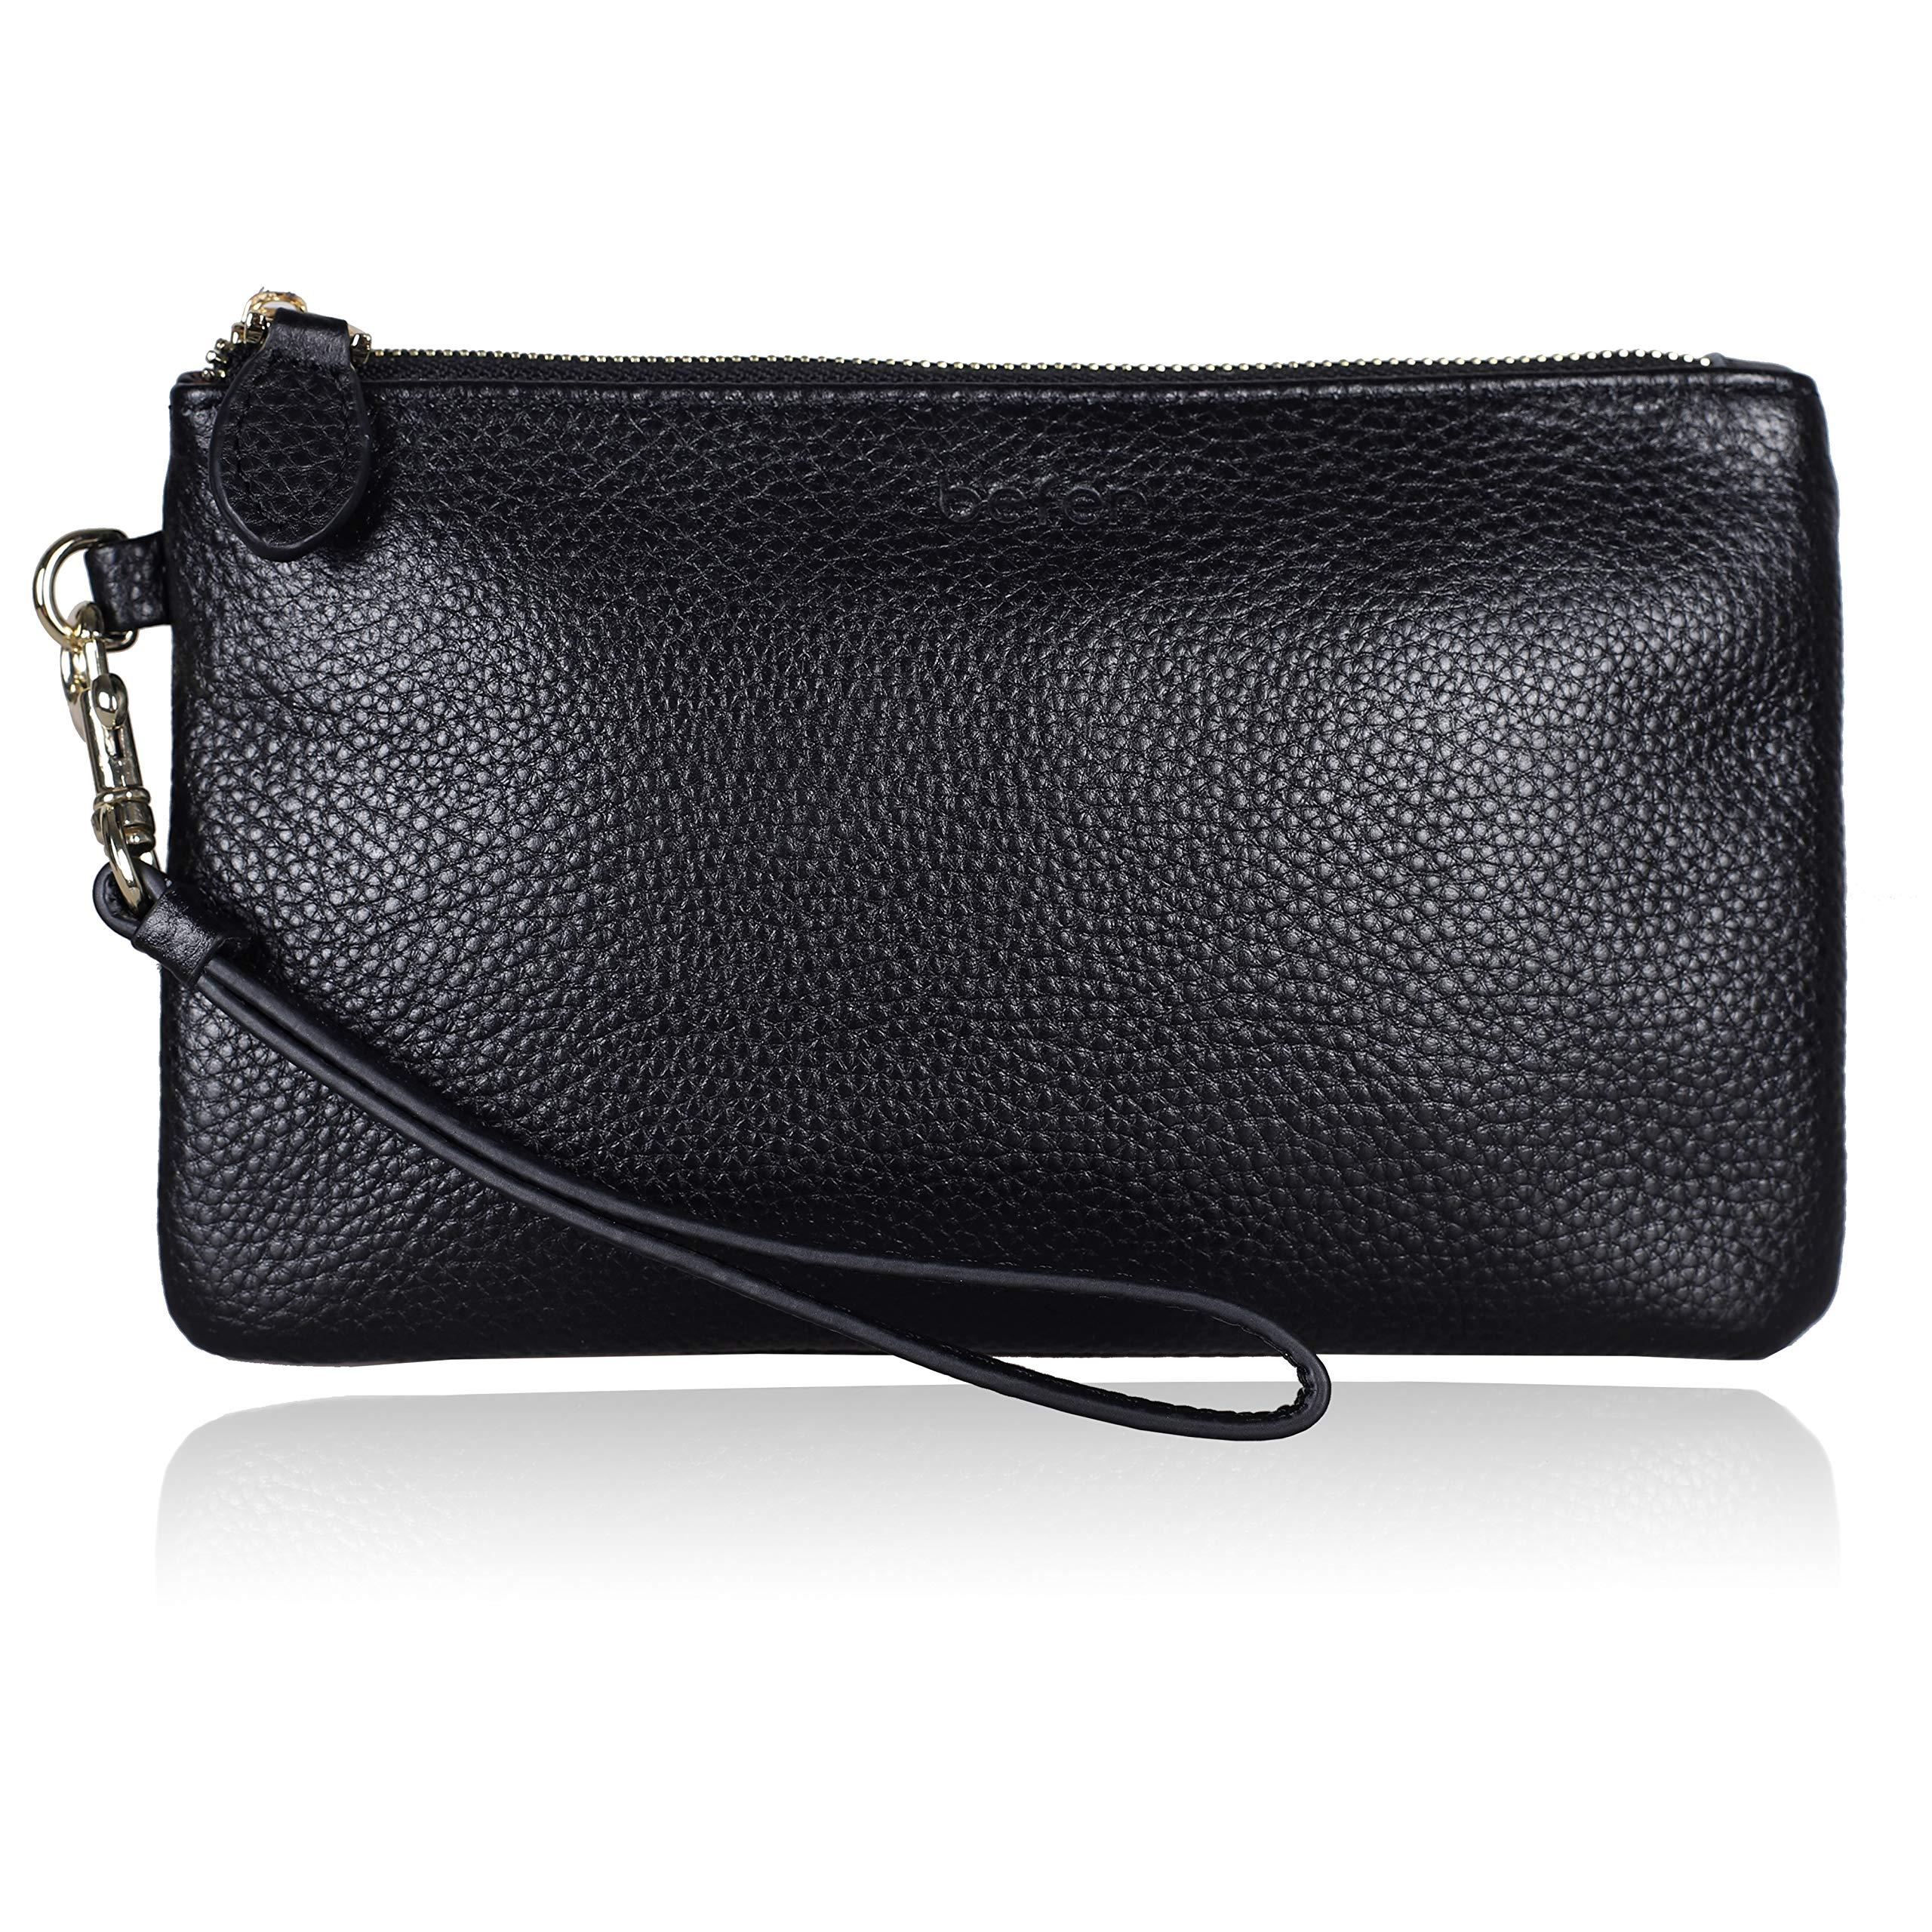 Leather Clutch Wristlets Purses FERRISA Wristlets Wallet Cell Phone Holder Small Clutch Wristlet Handbags for Women